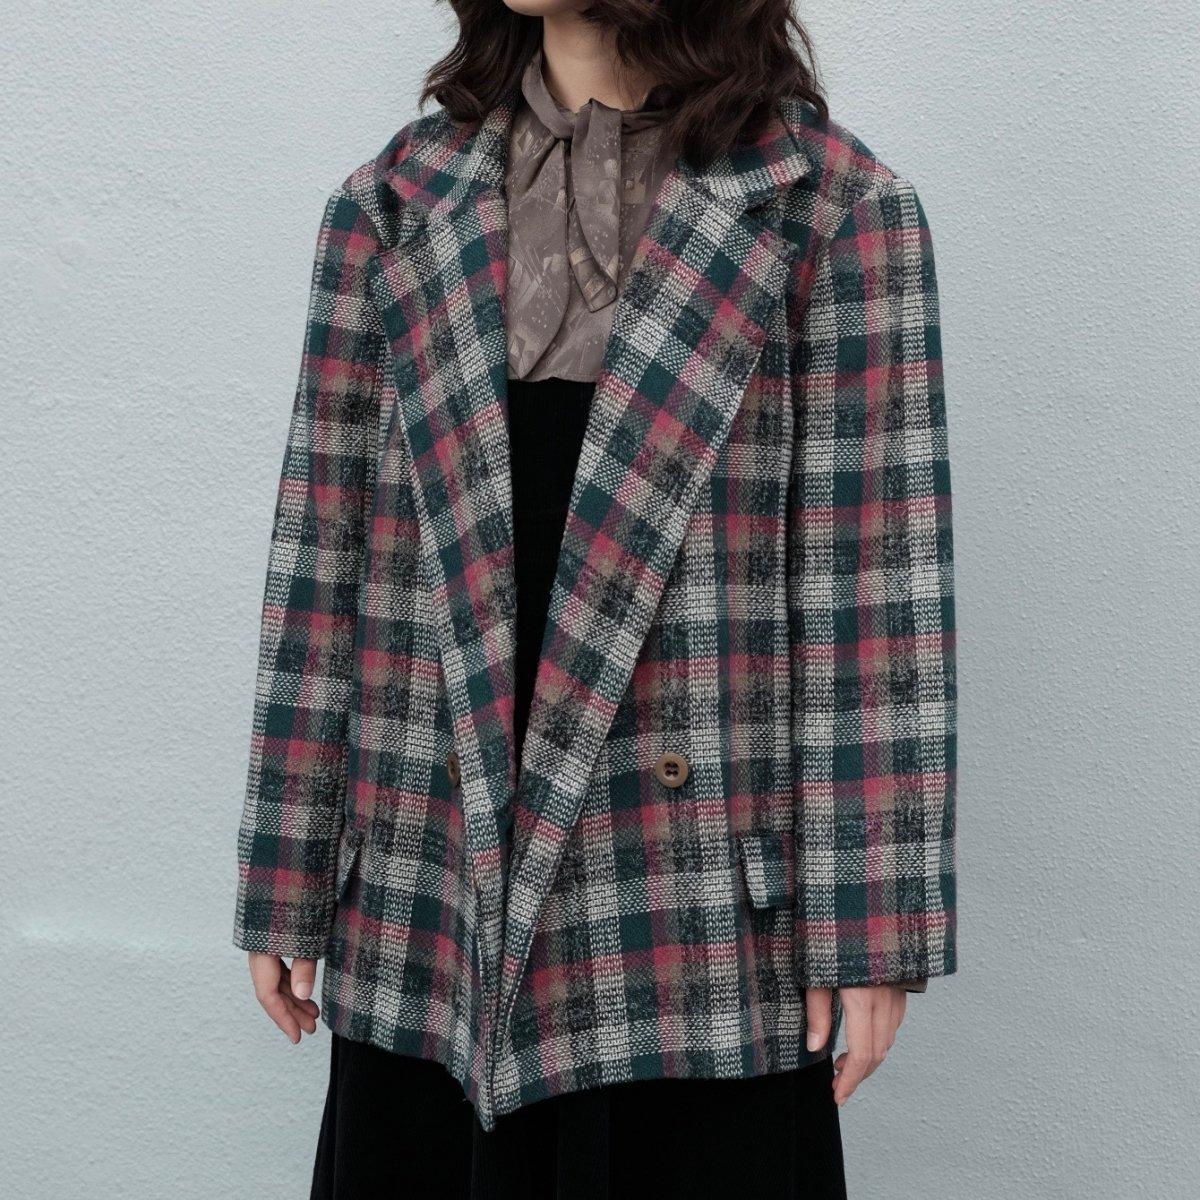 [VINTAGE] Pink & Green Plaid Single Blazer